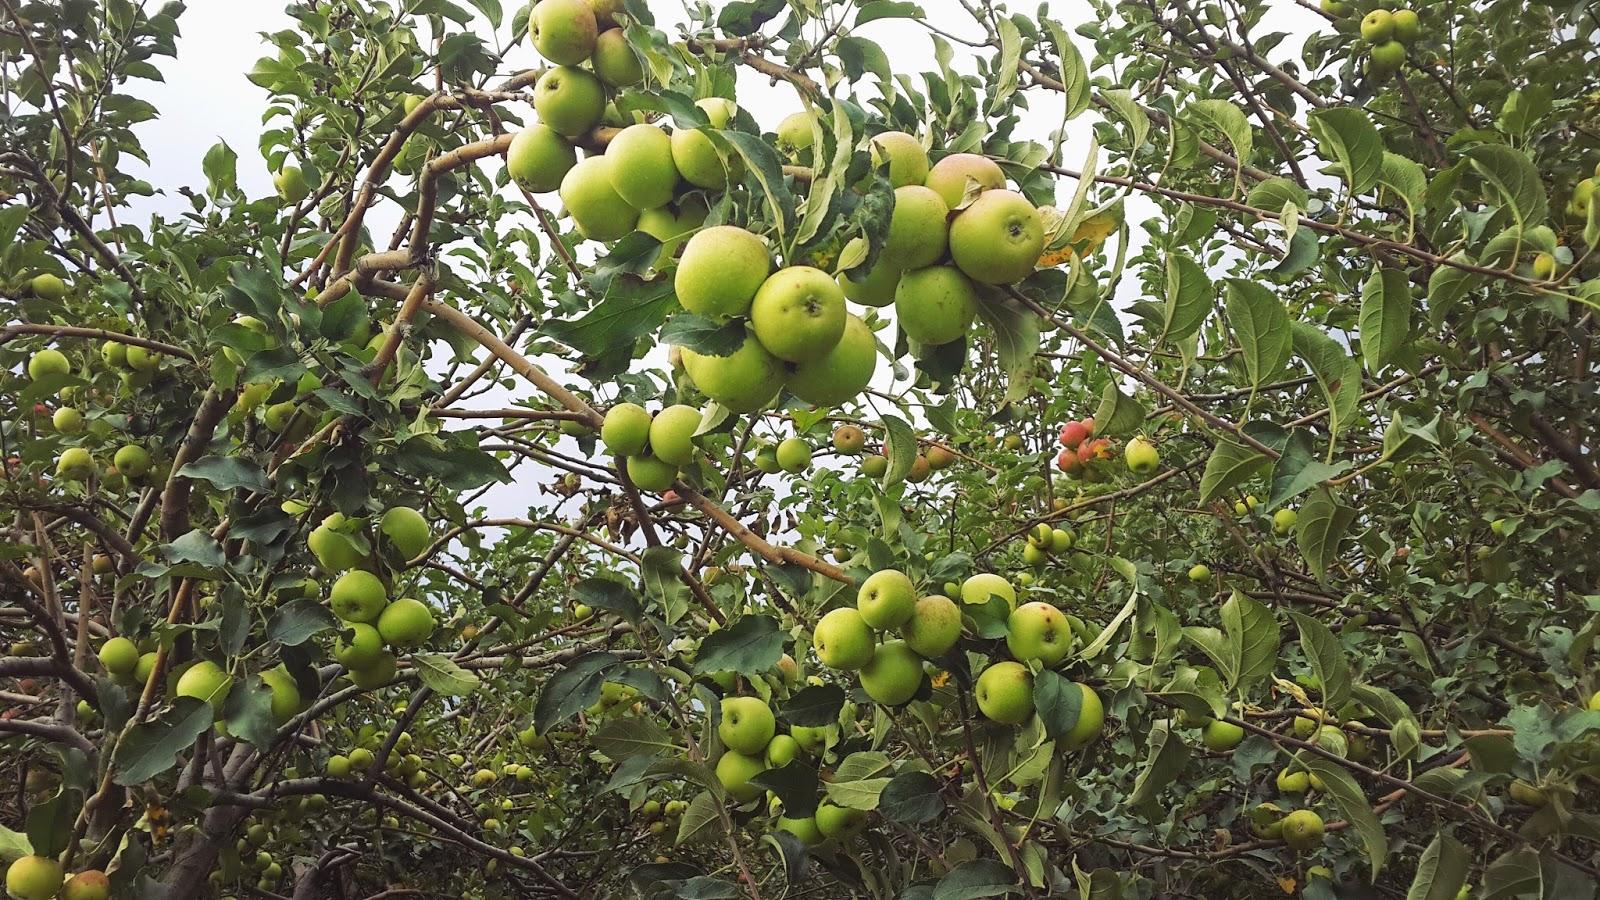 Petik Apel Green Garden